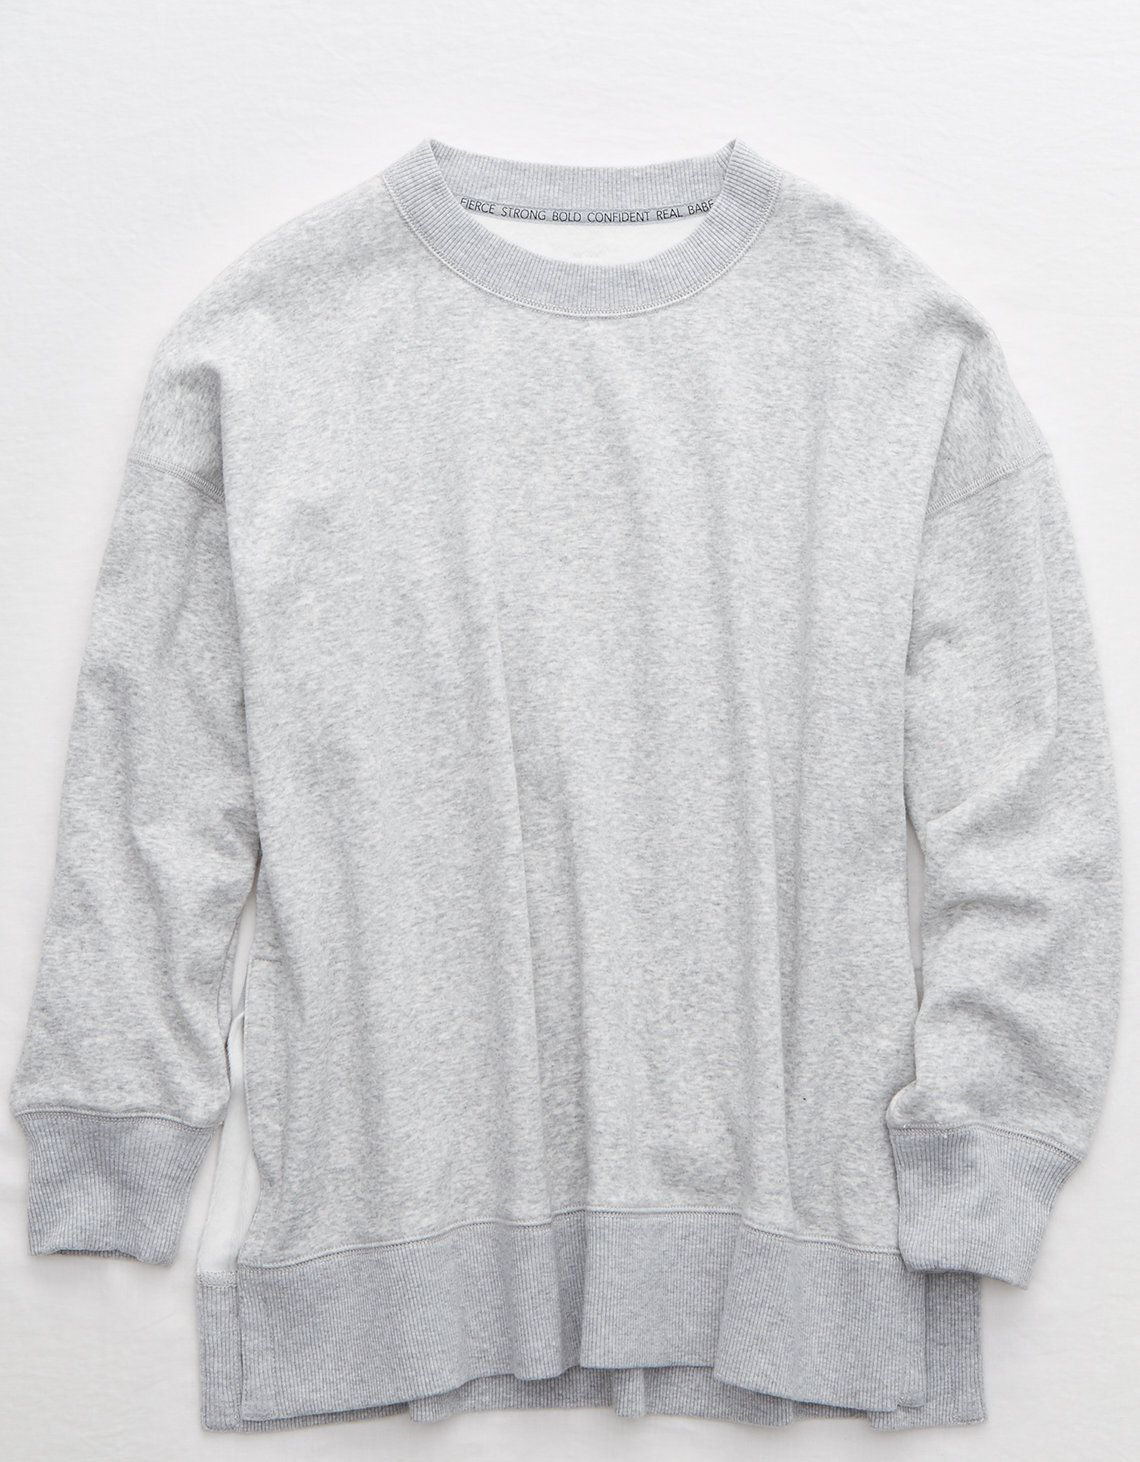 Aerie Oversized Coziest Desert Sweatshirt Mens Outfitters Sweatshirts Sweatshirts Women [ 1462 x 1140 Pixel ]